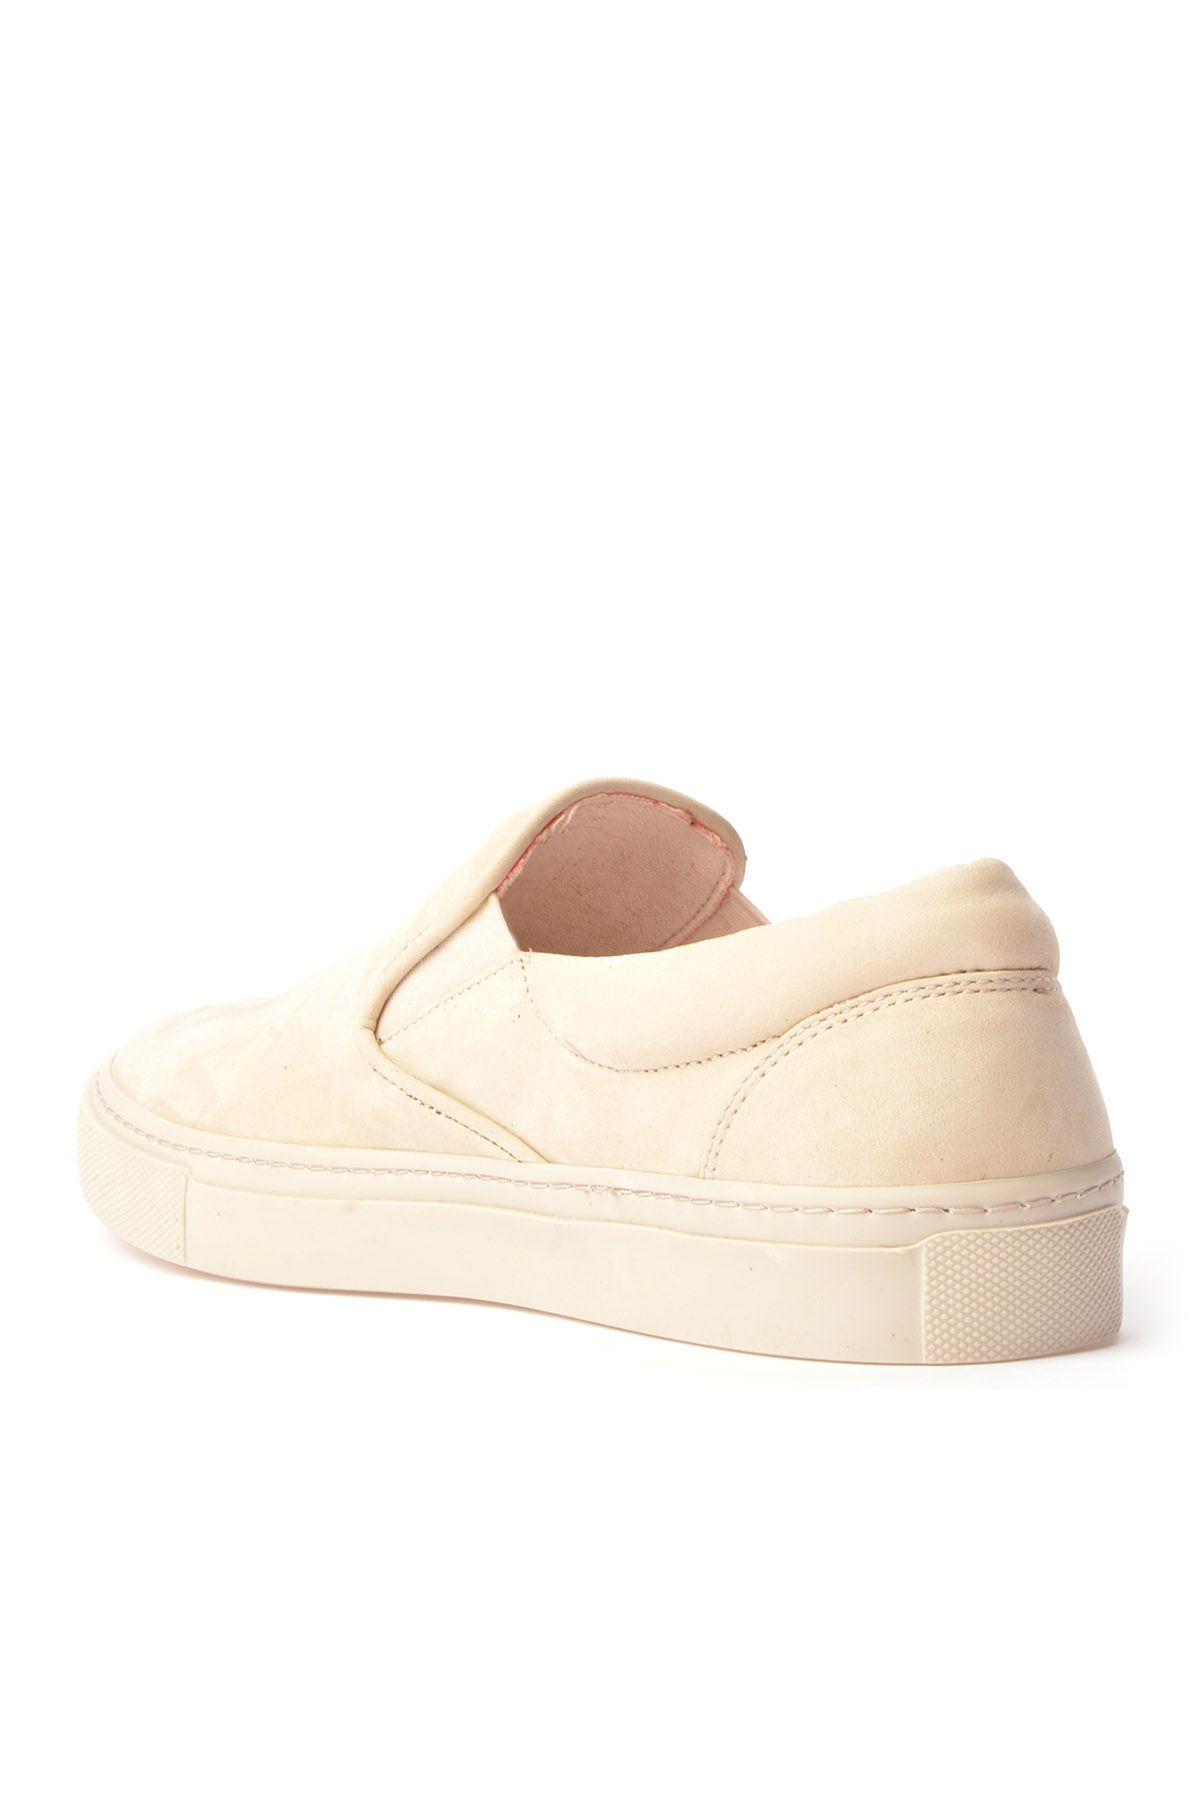 Art Goya Hakiki Nubuk Deri Bayan Sneaker  Bej